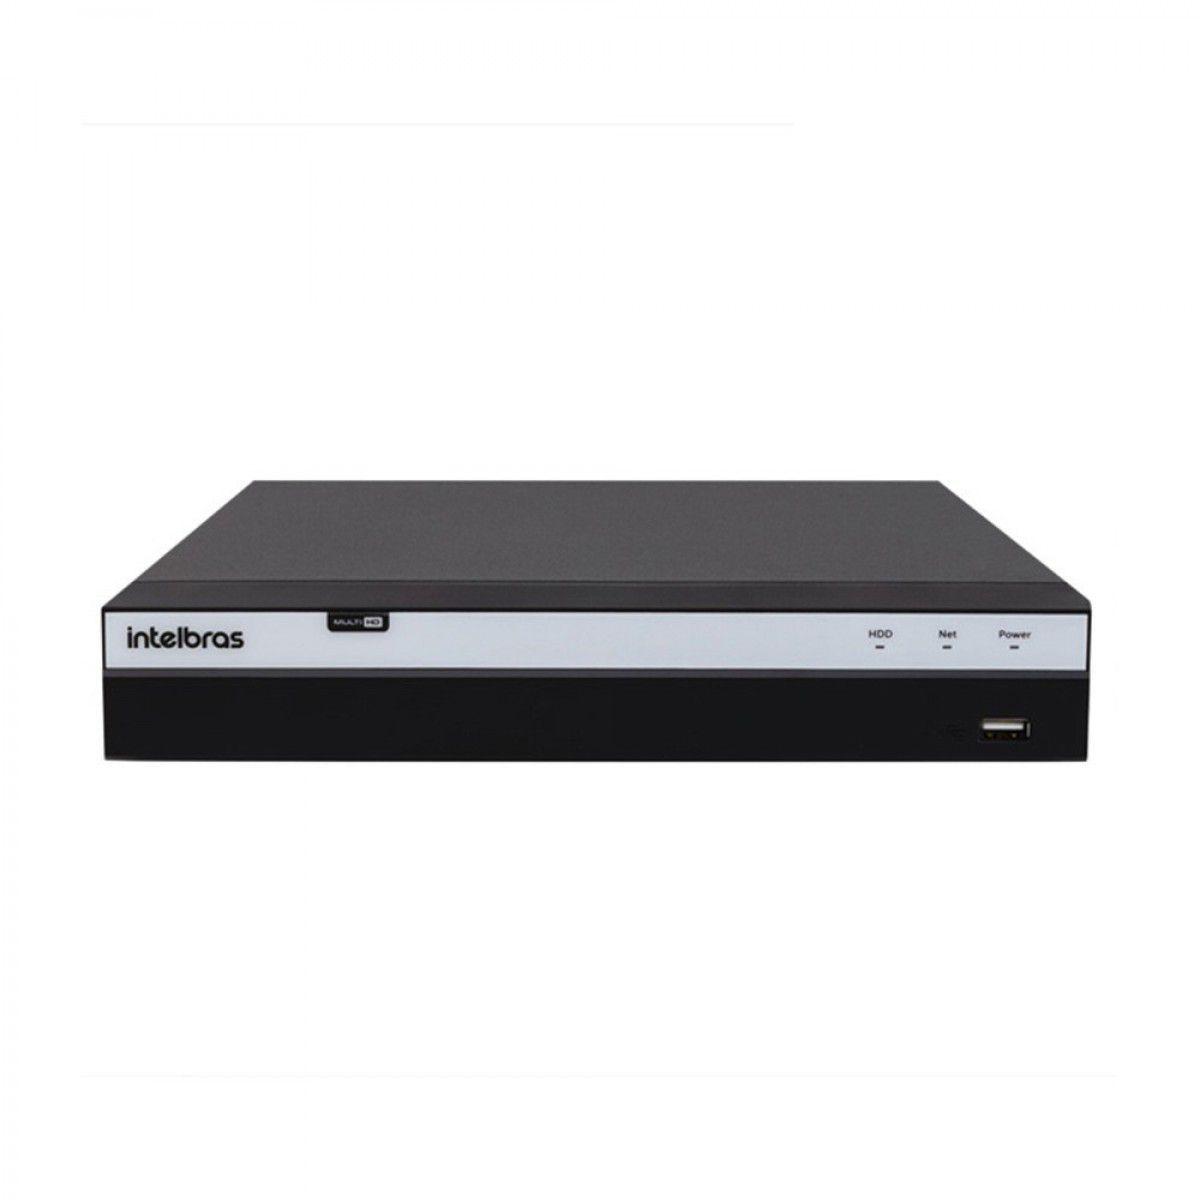 Dvr Stand Alone 4 Canais 3004 Full Hd + HD Purple 1TB 1080p Intelbras Multi